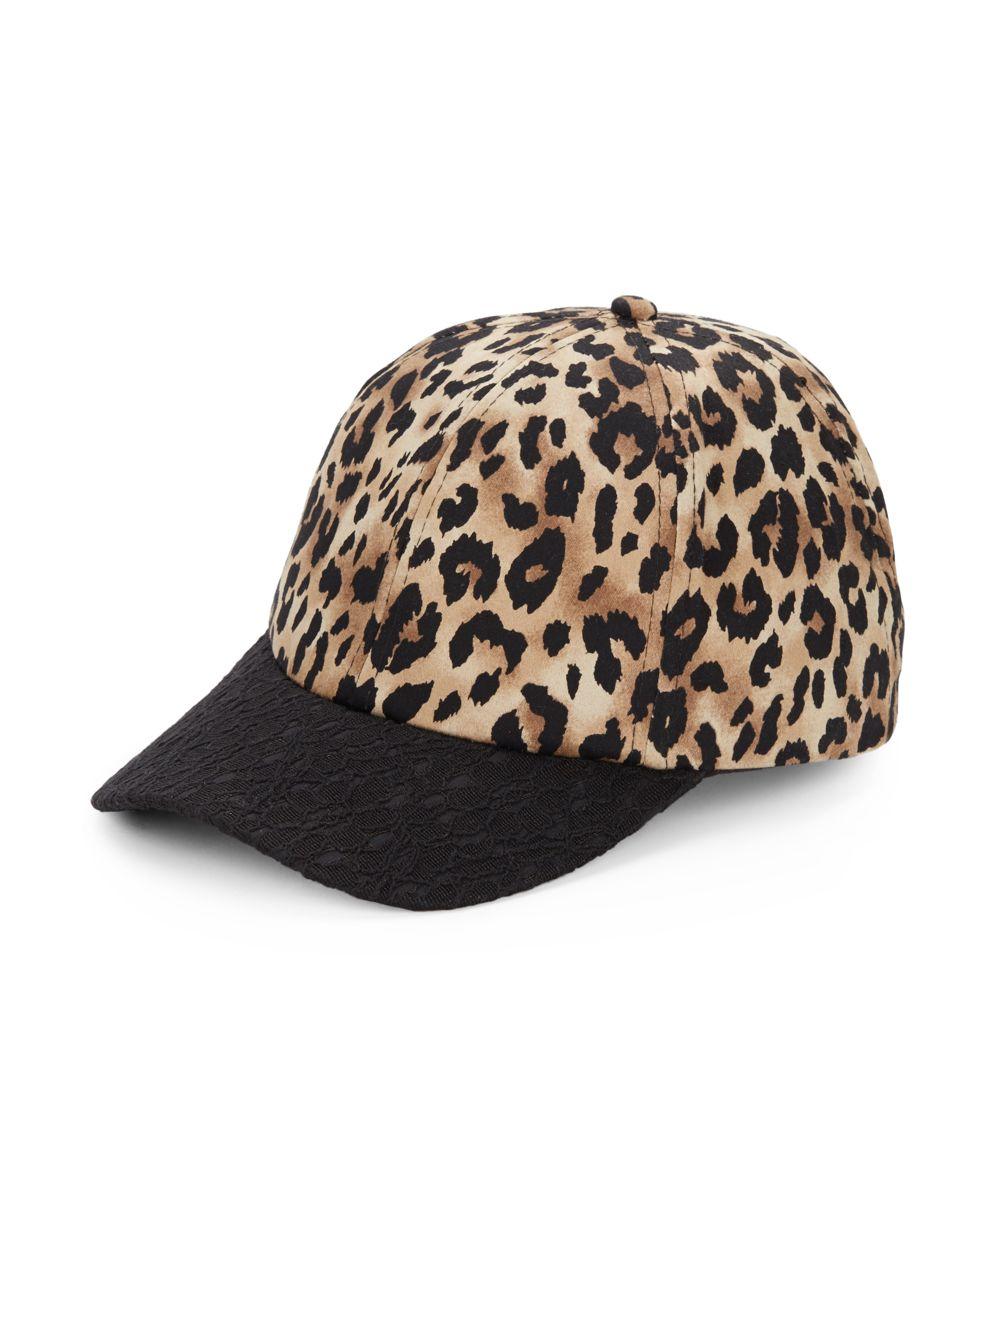 Lyst - Saks Fifth Avenue Lace   Leopard-Print Baseball Cap 408d85d30c2